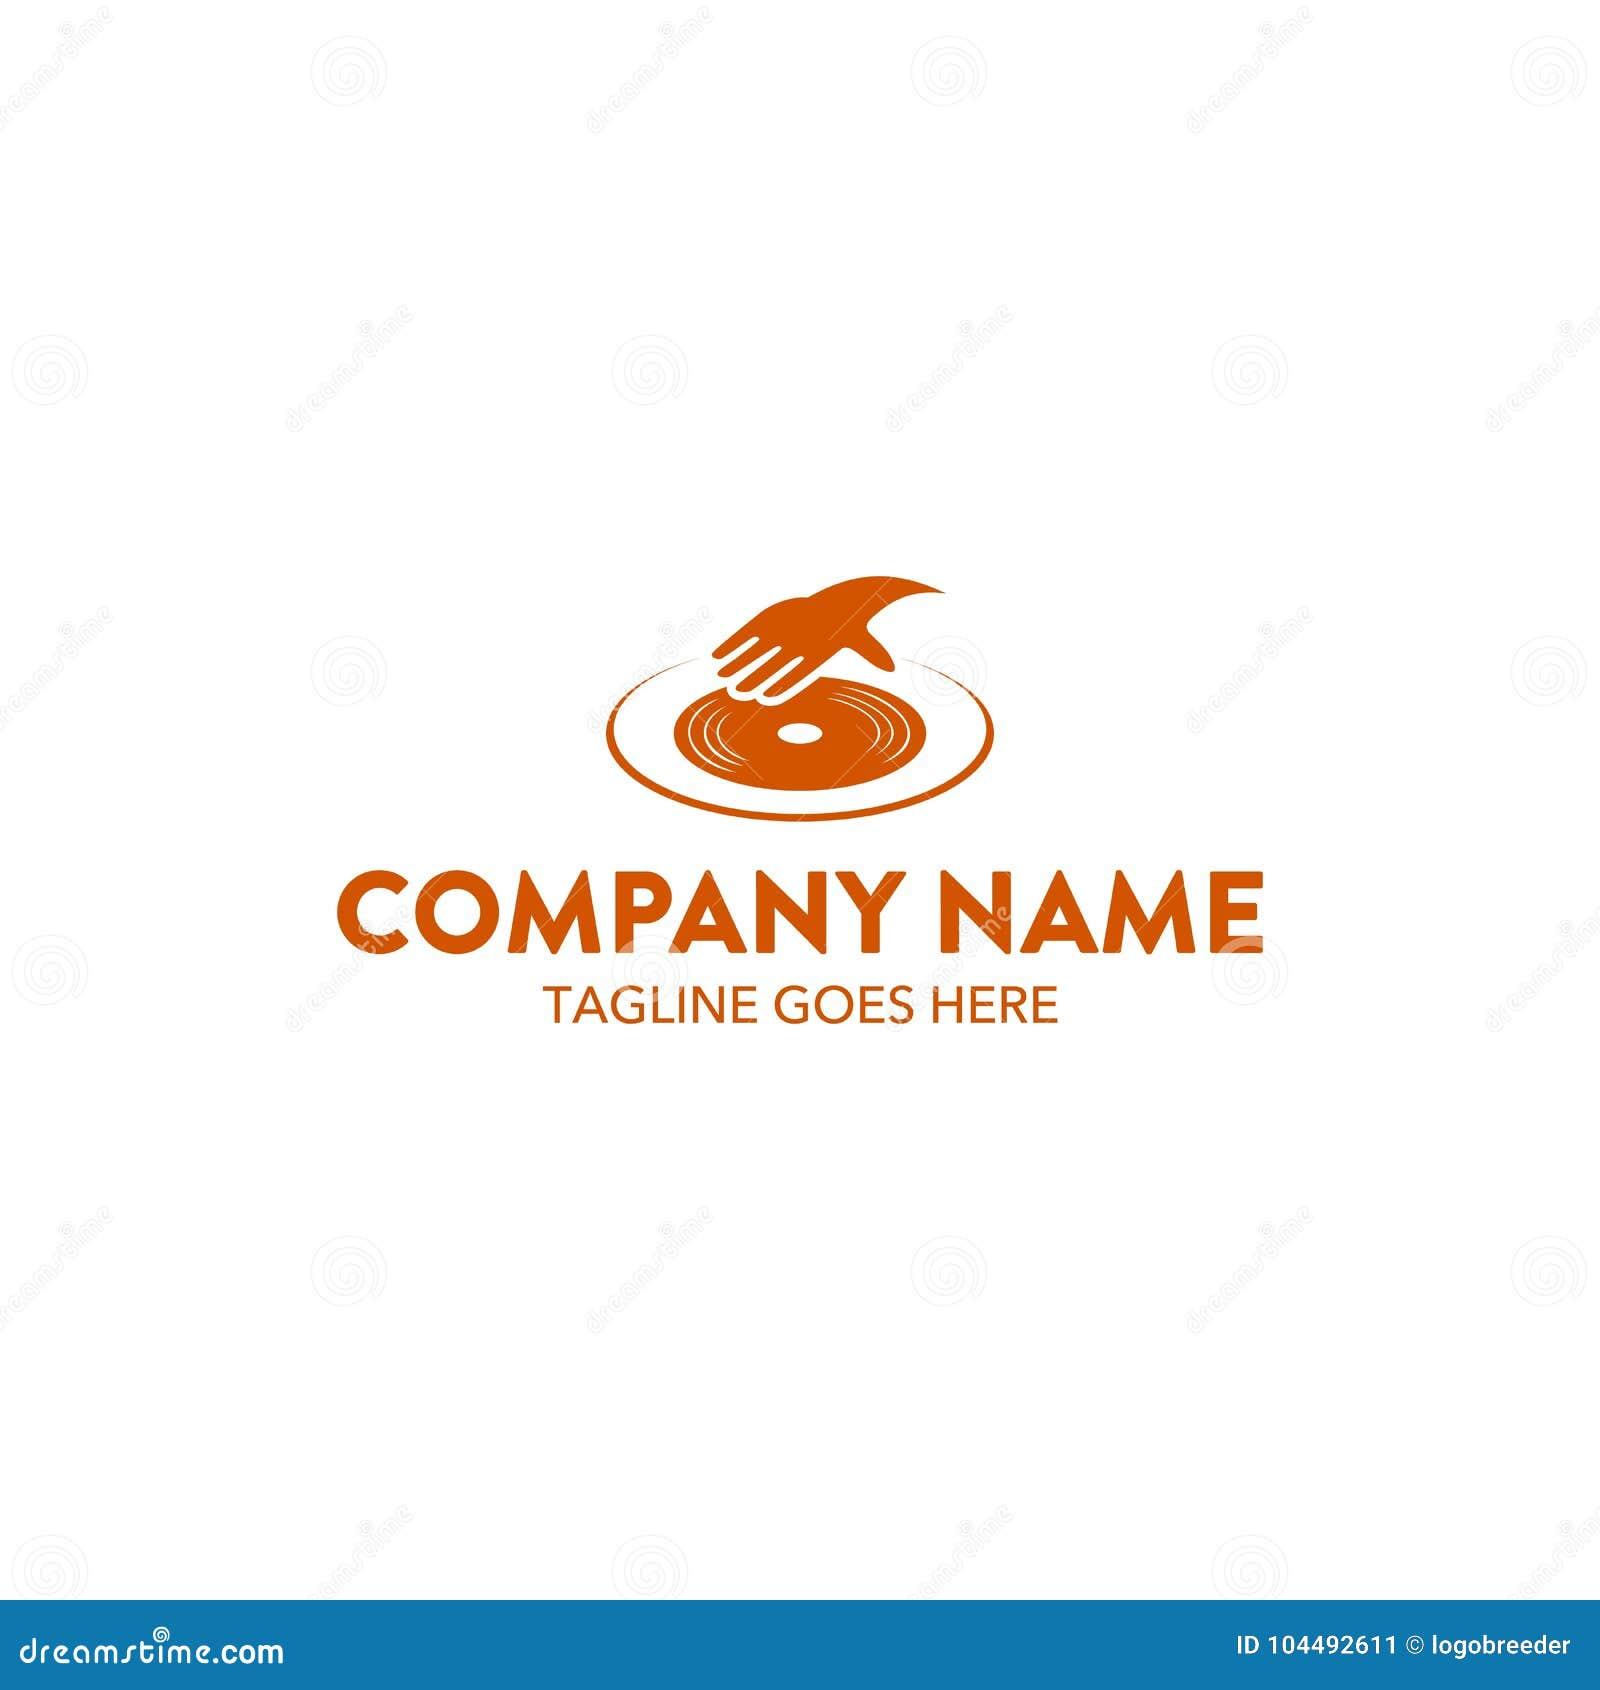 Unique Dj Music Related Logo Template. Vector. Editable Stock Vector ...